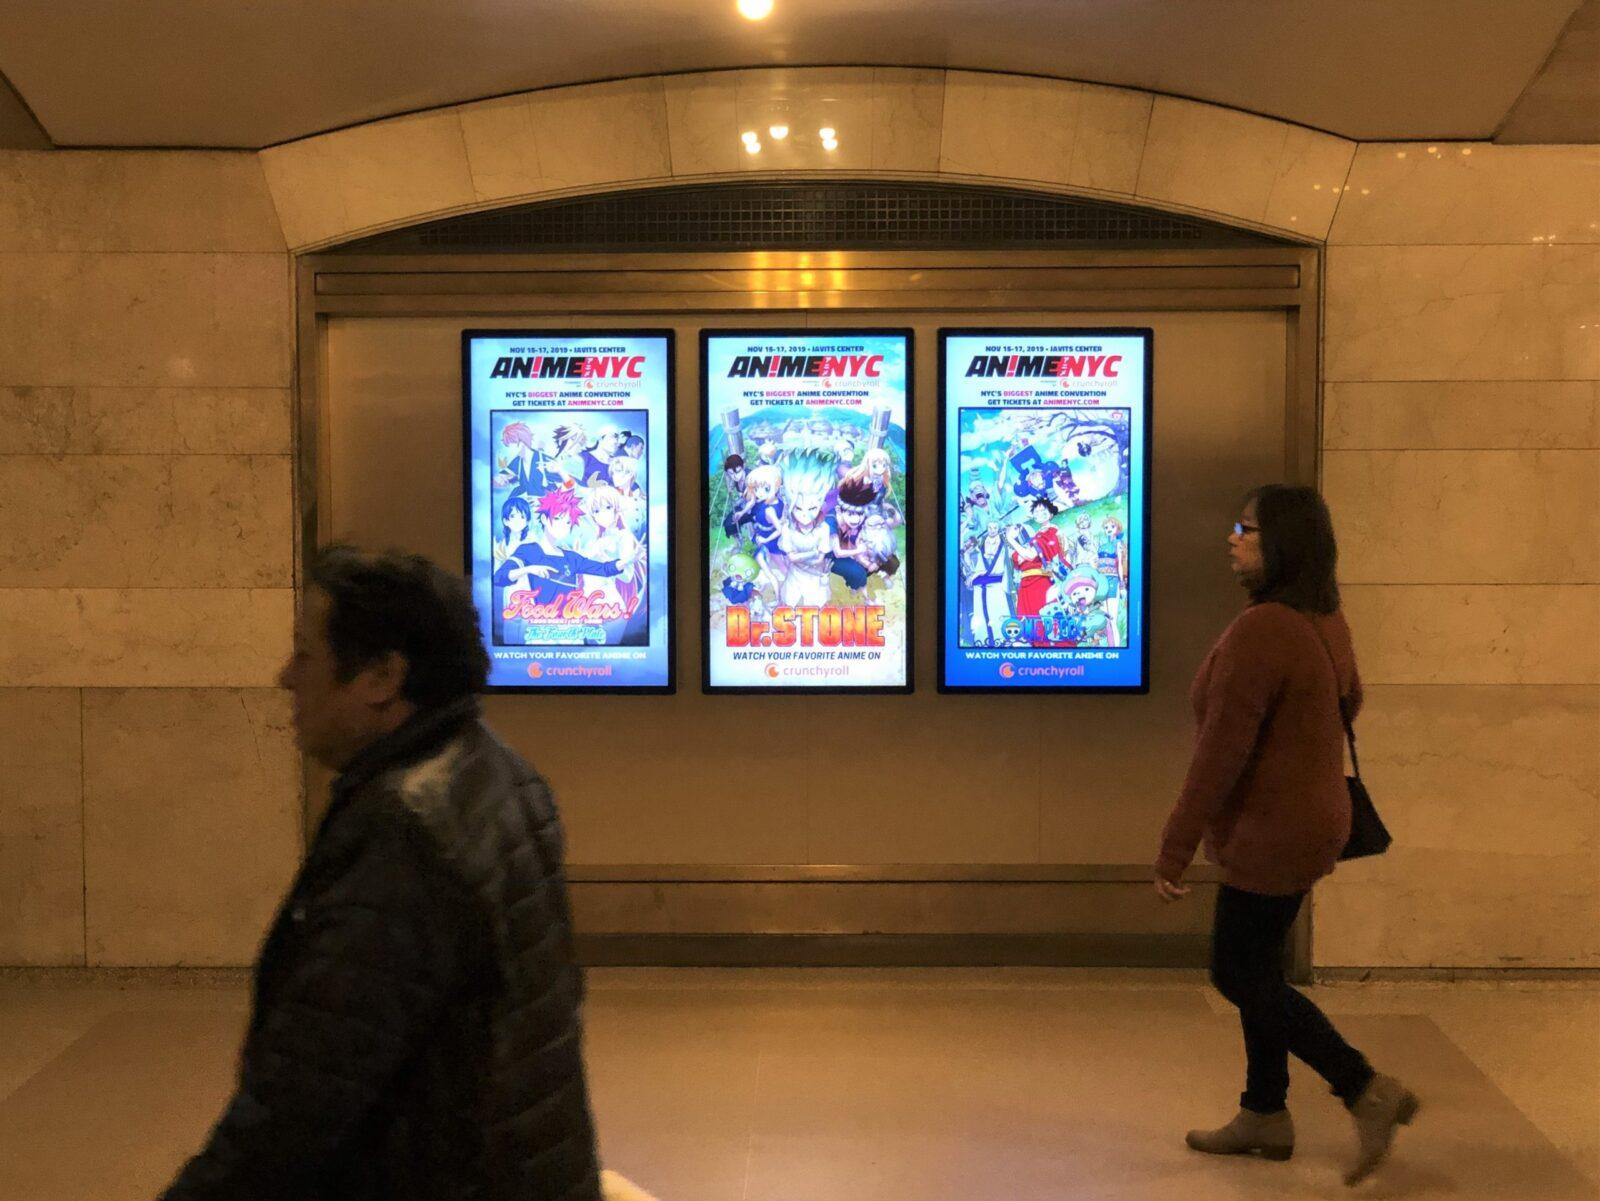 AnimeNYC Digital Liveboard Advertising